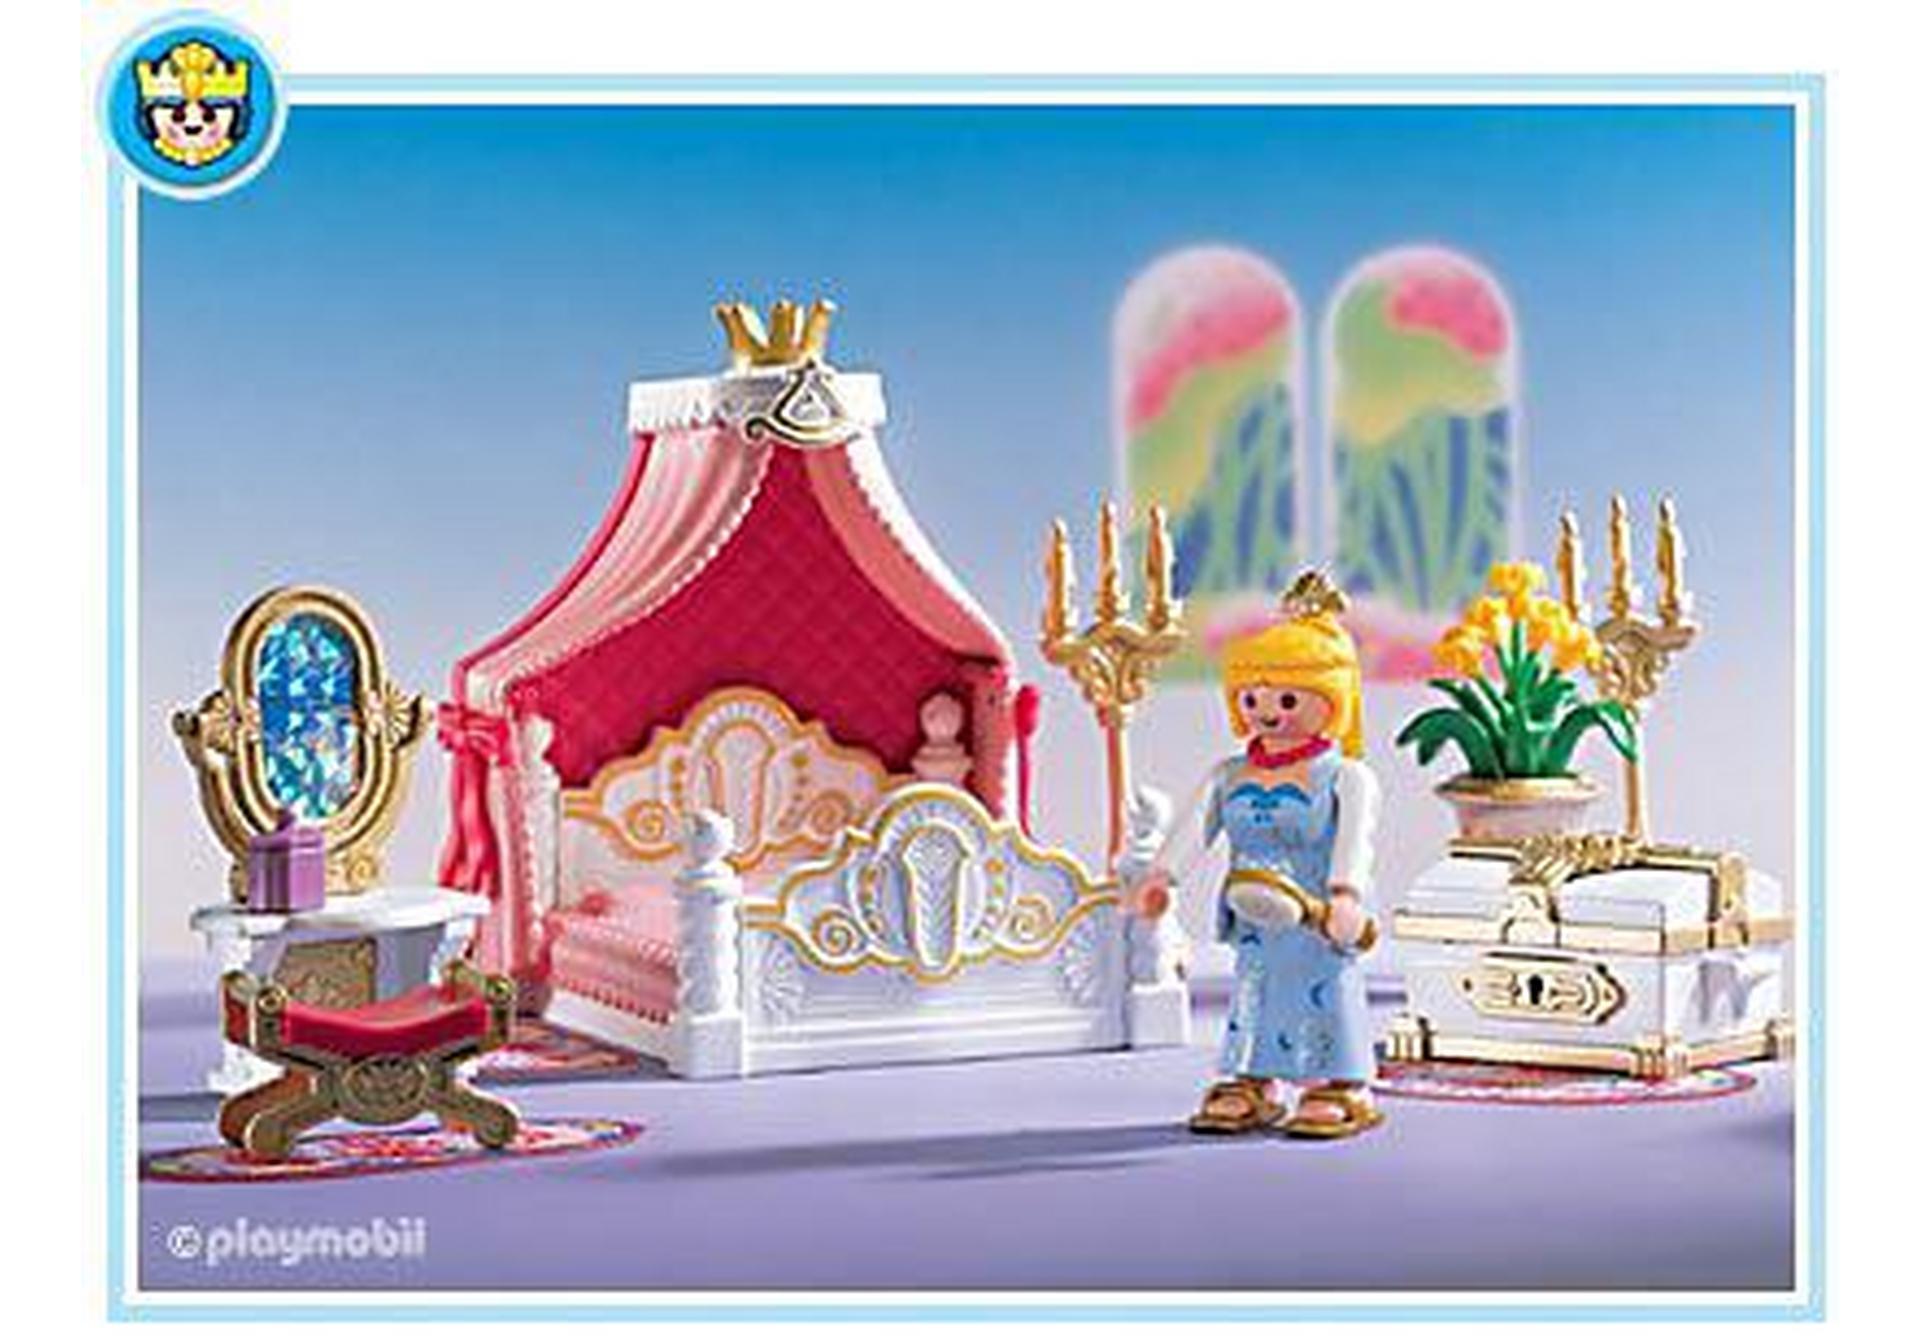 Chambre de la princesse - 3020-A - PLAYMOBIL® France